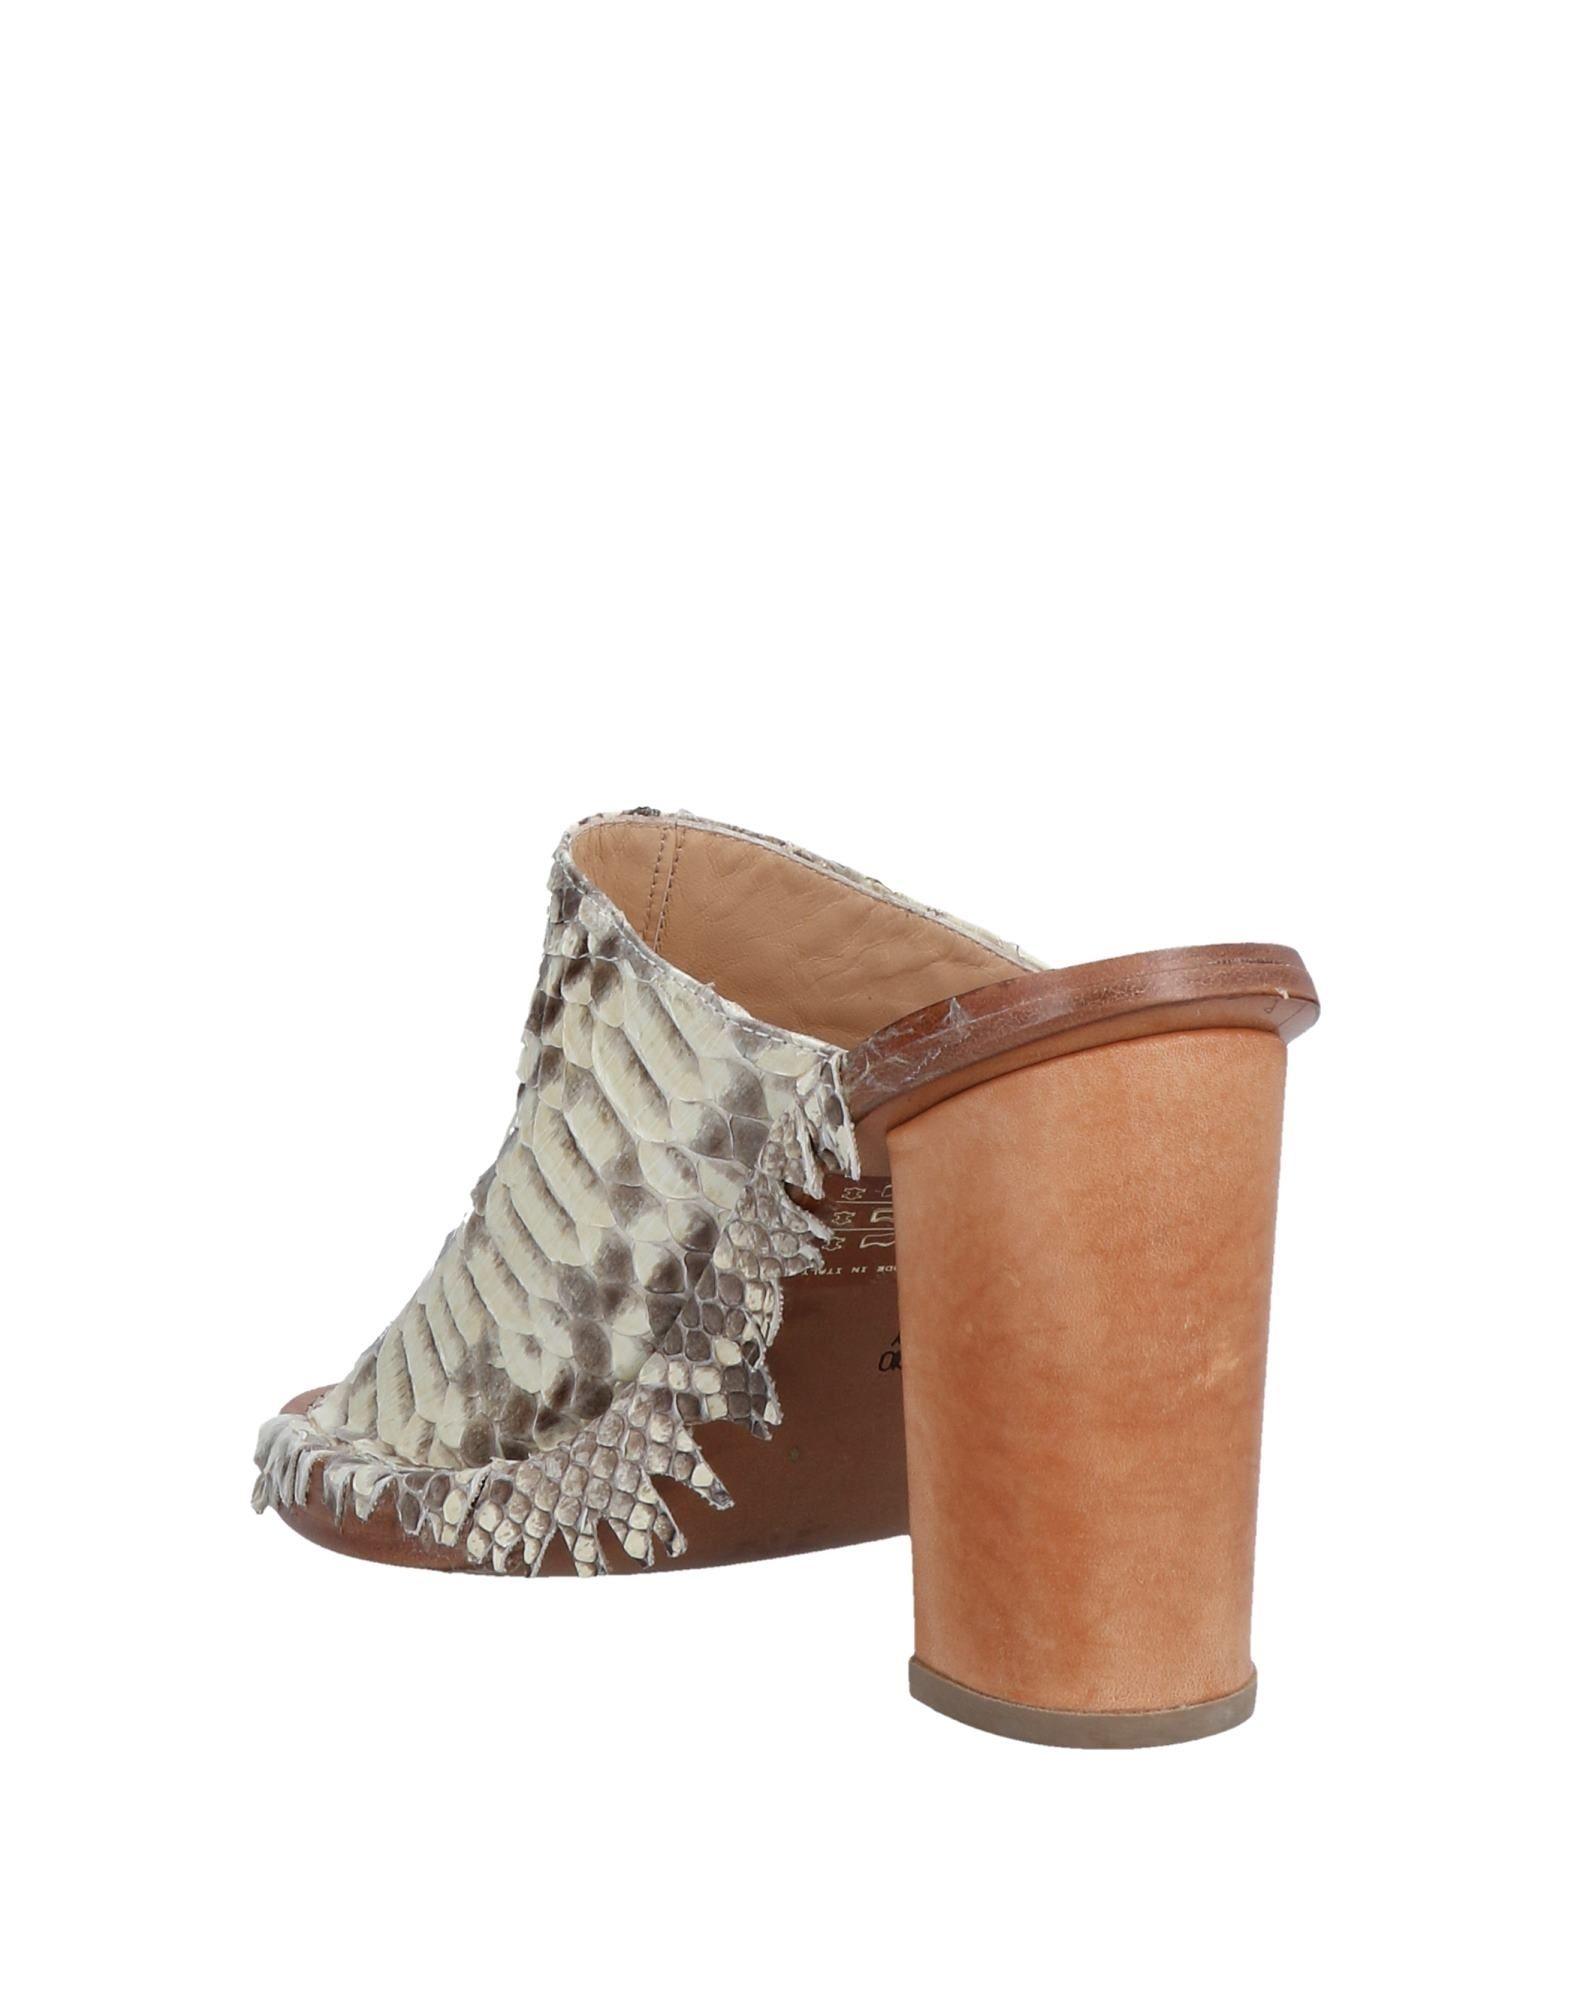 erika cavallini erika sandales - femmes erika cavallini cavallini sandales en ligne sur l'australie - 11580734ad 93d054